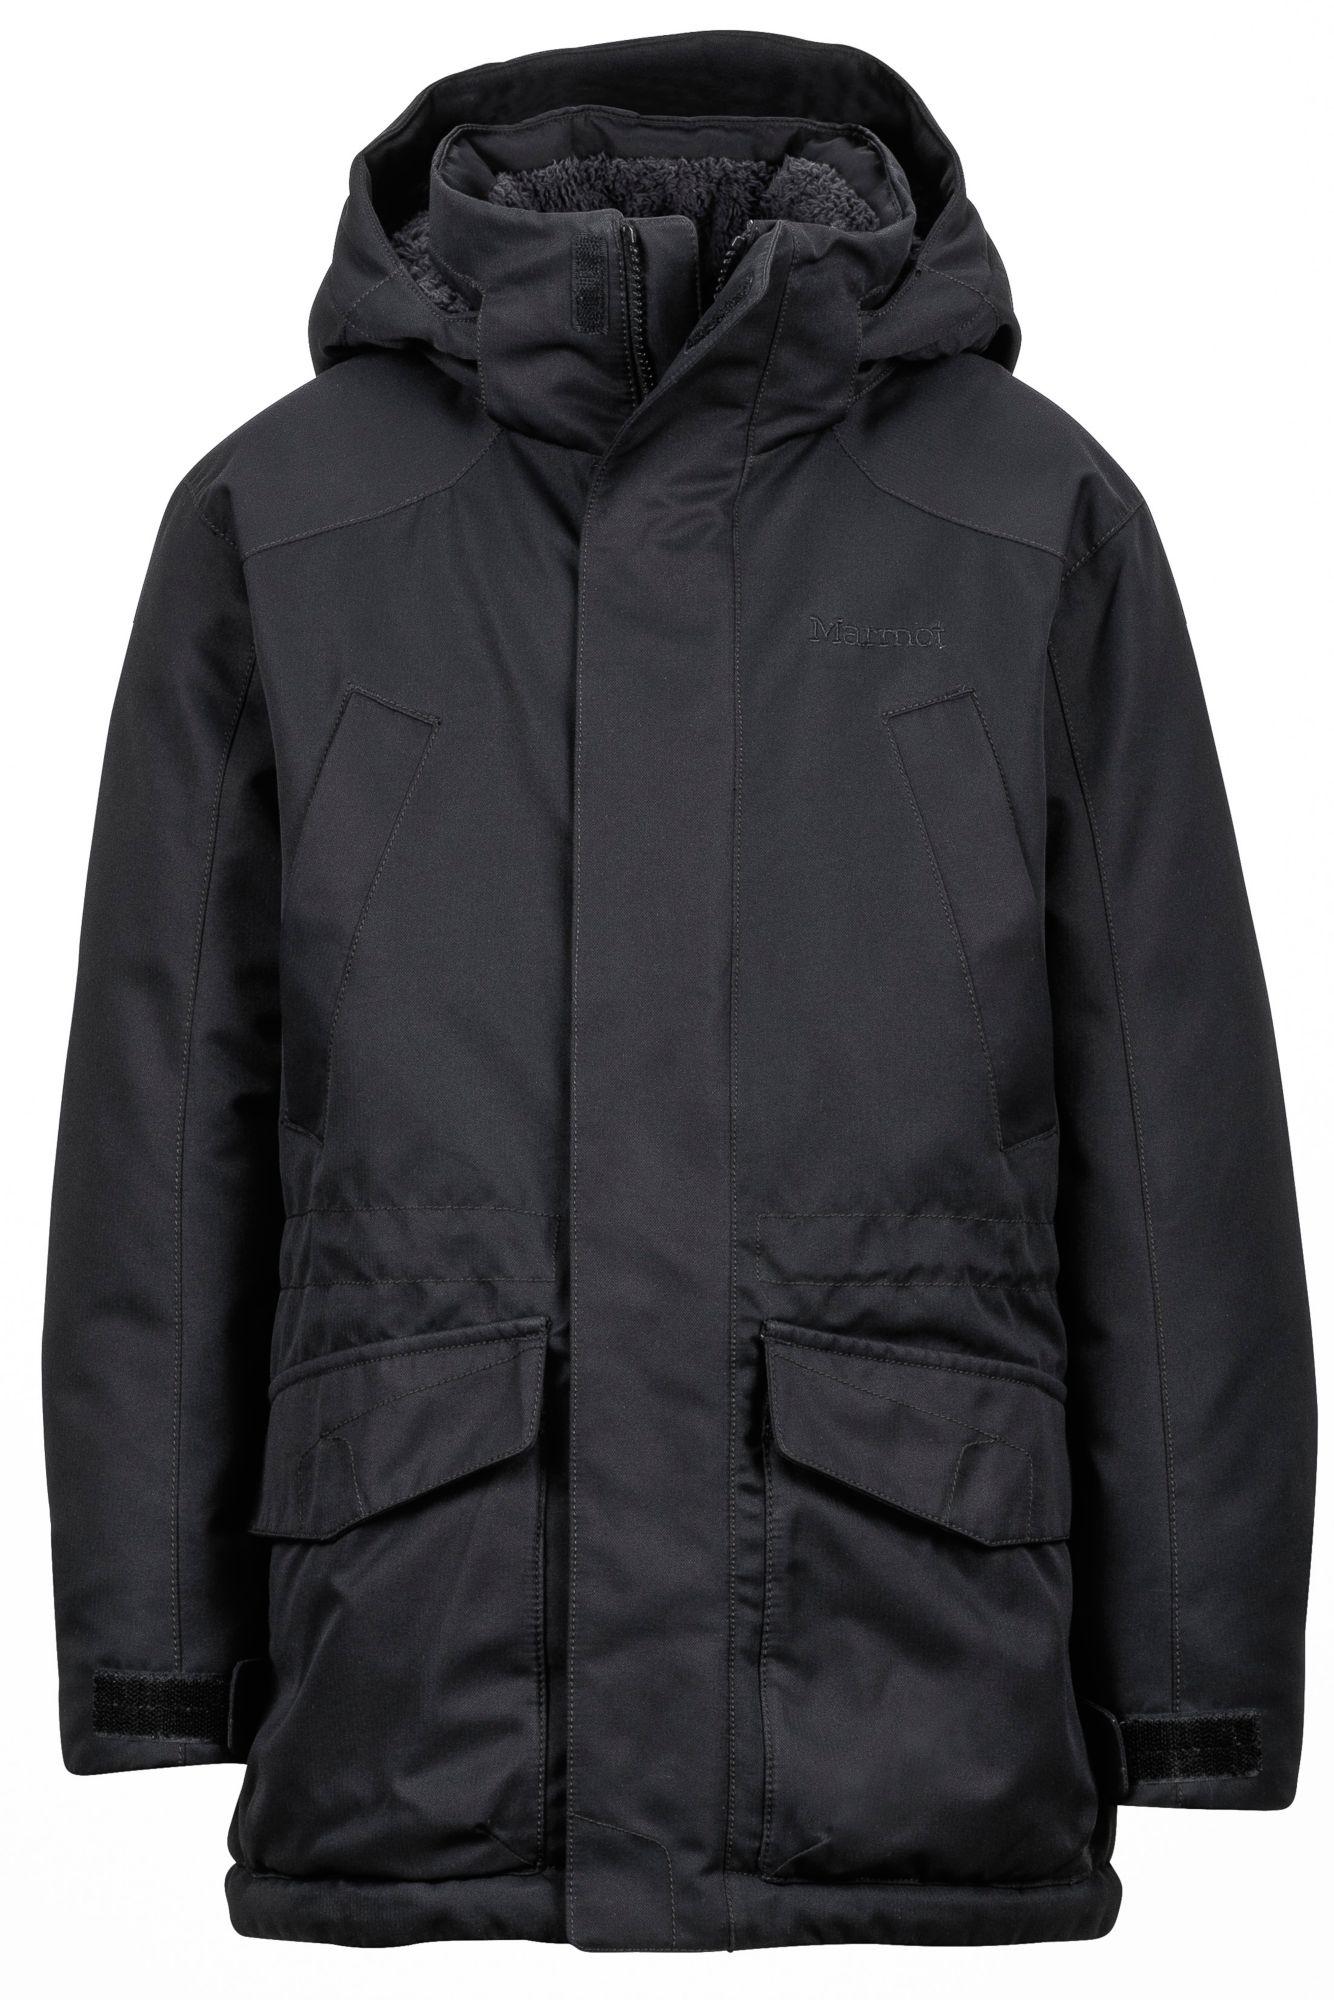 Kids black coat